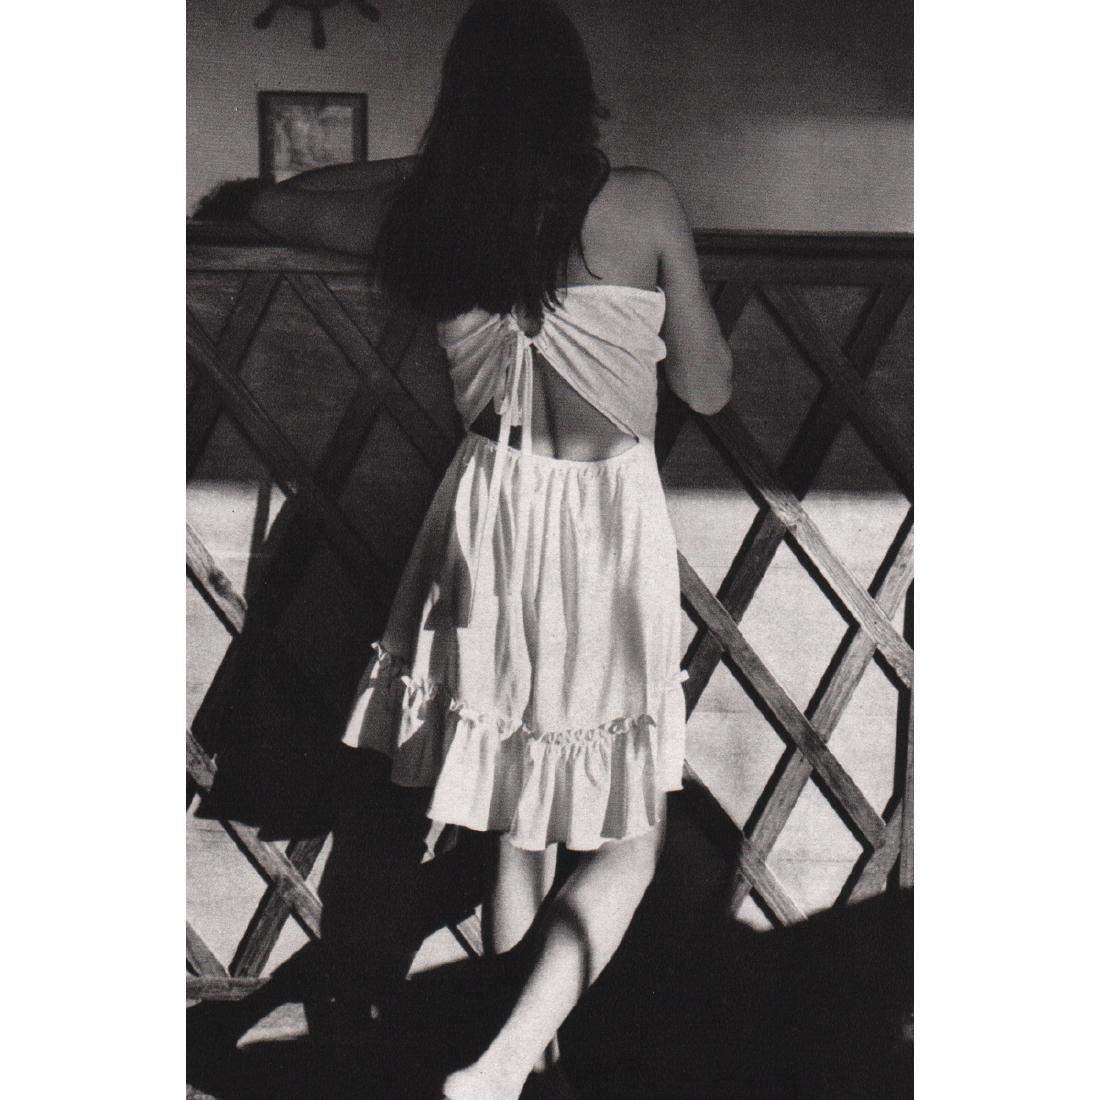 EDOUARD BOUBAT - Mexique, 1978